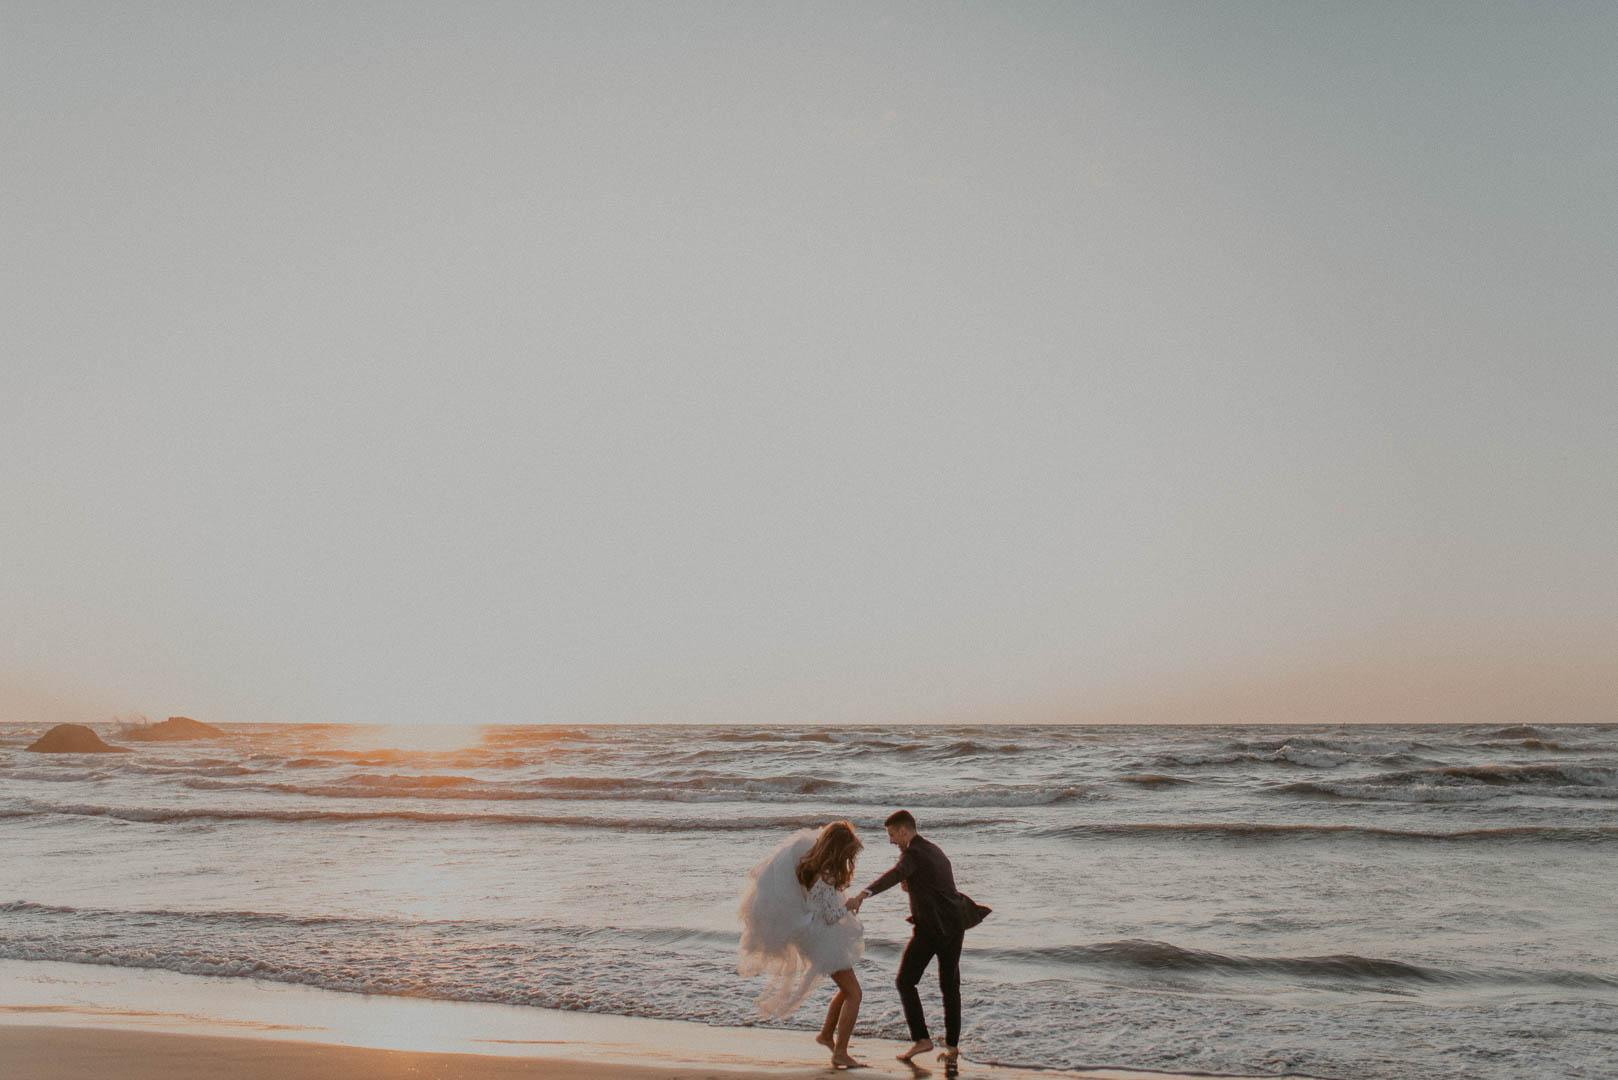 wedding-photographer-destination-fineart-bespoke-reportage-napoli-nabilah-vivianeizzo-spazio46-122